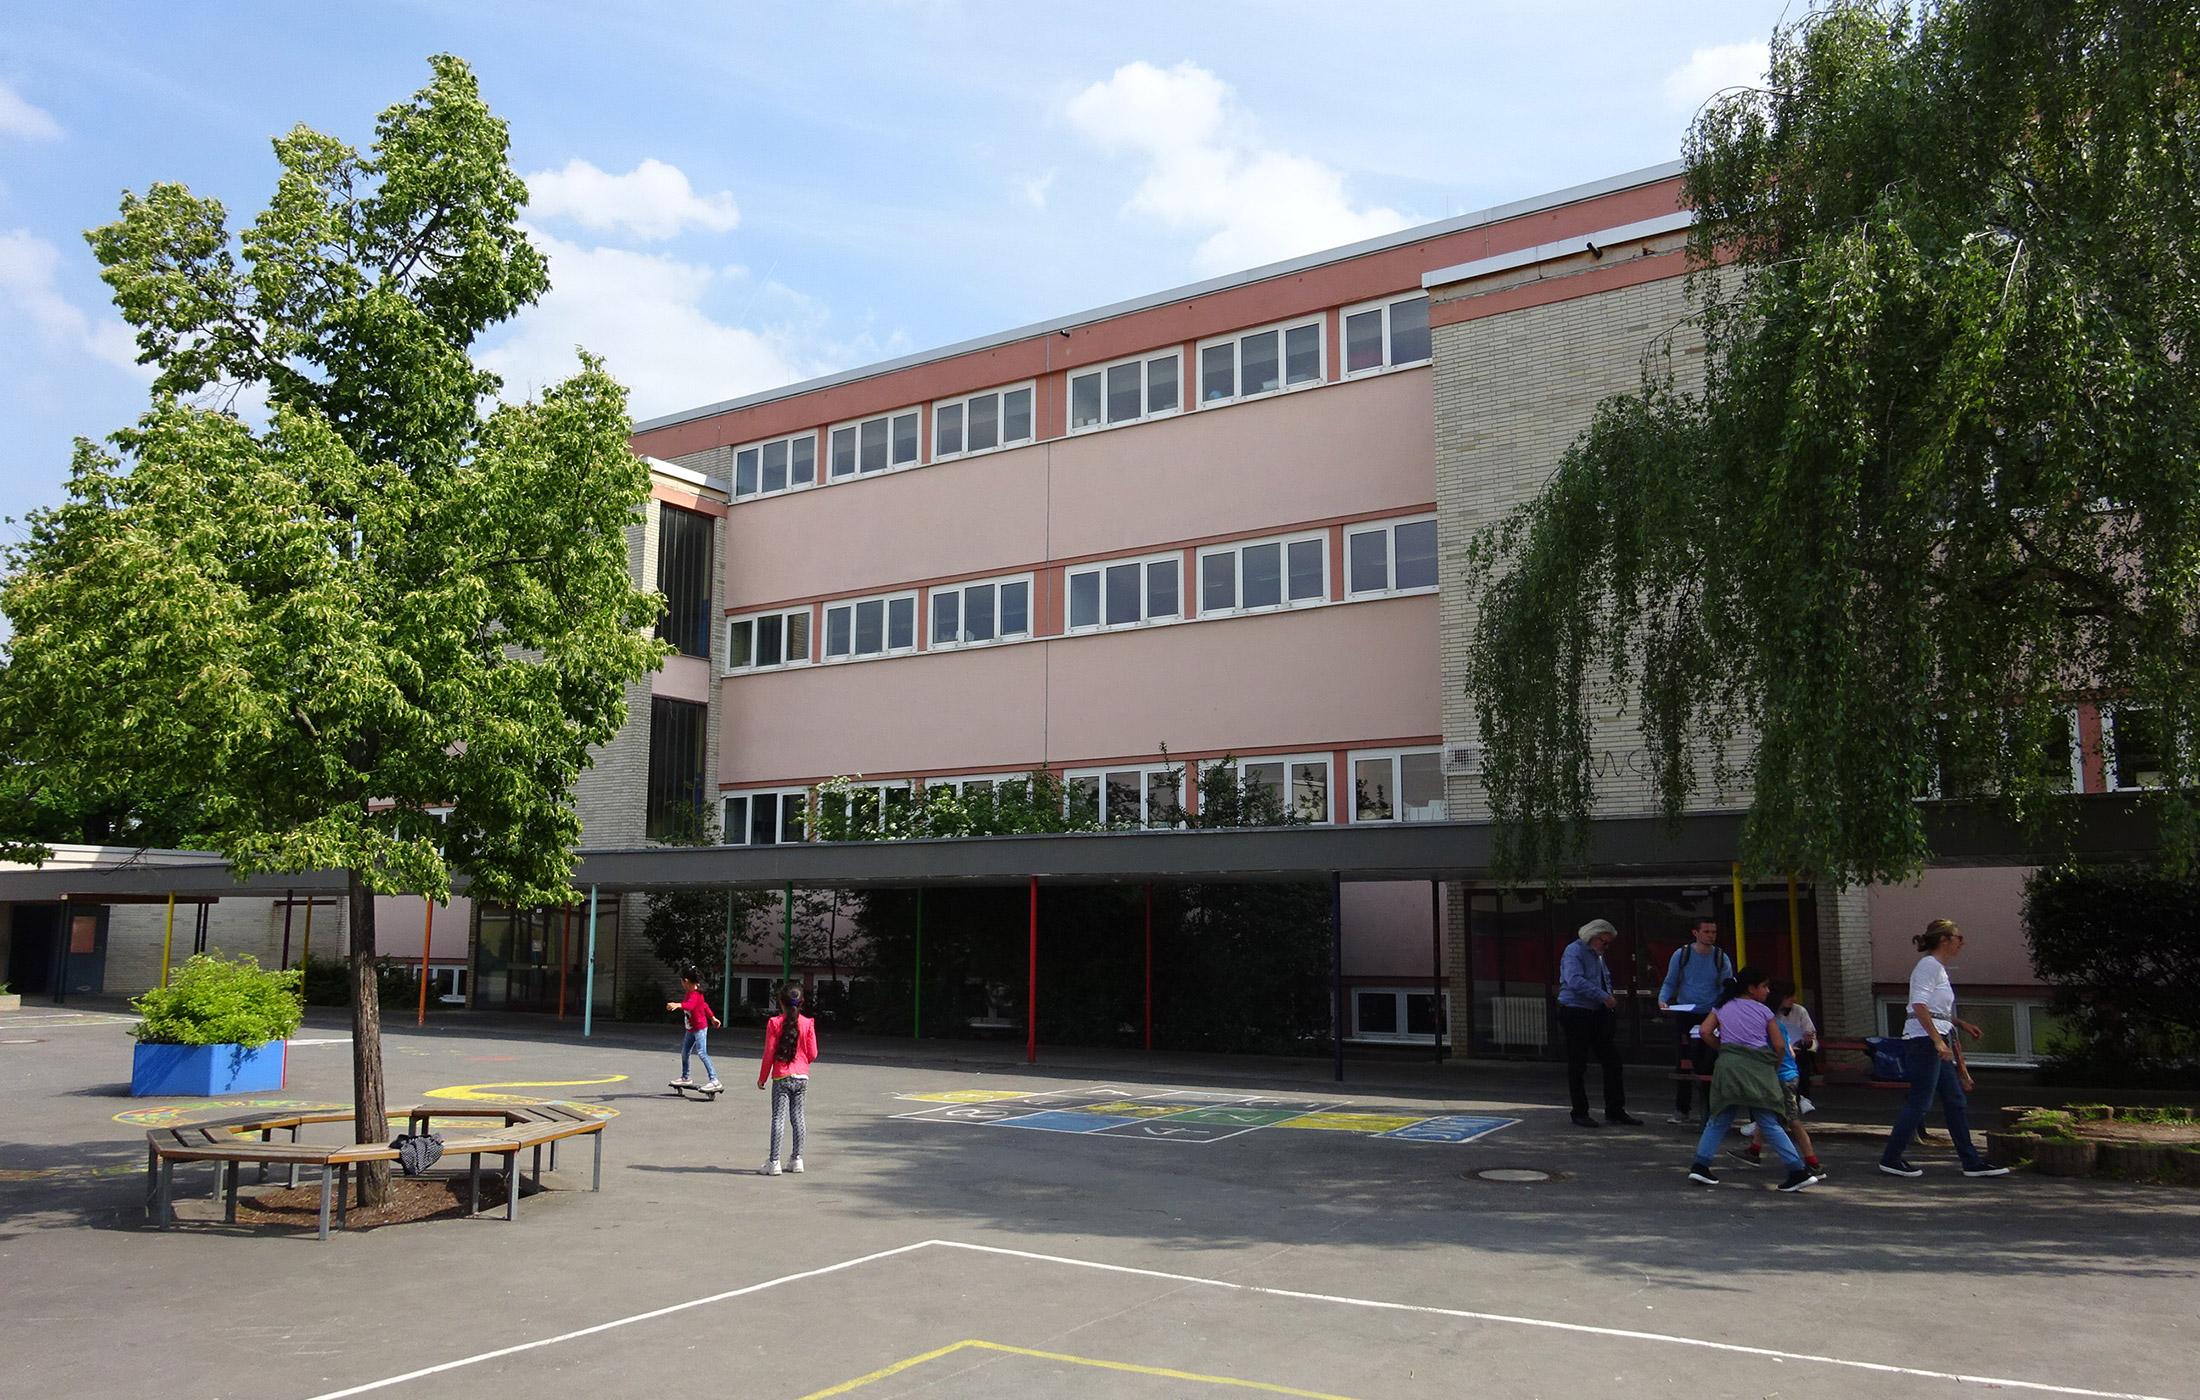 Berthold-Otto-Schule Frankfurt am Main